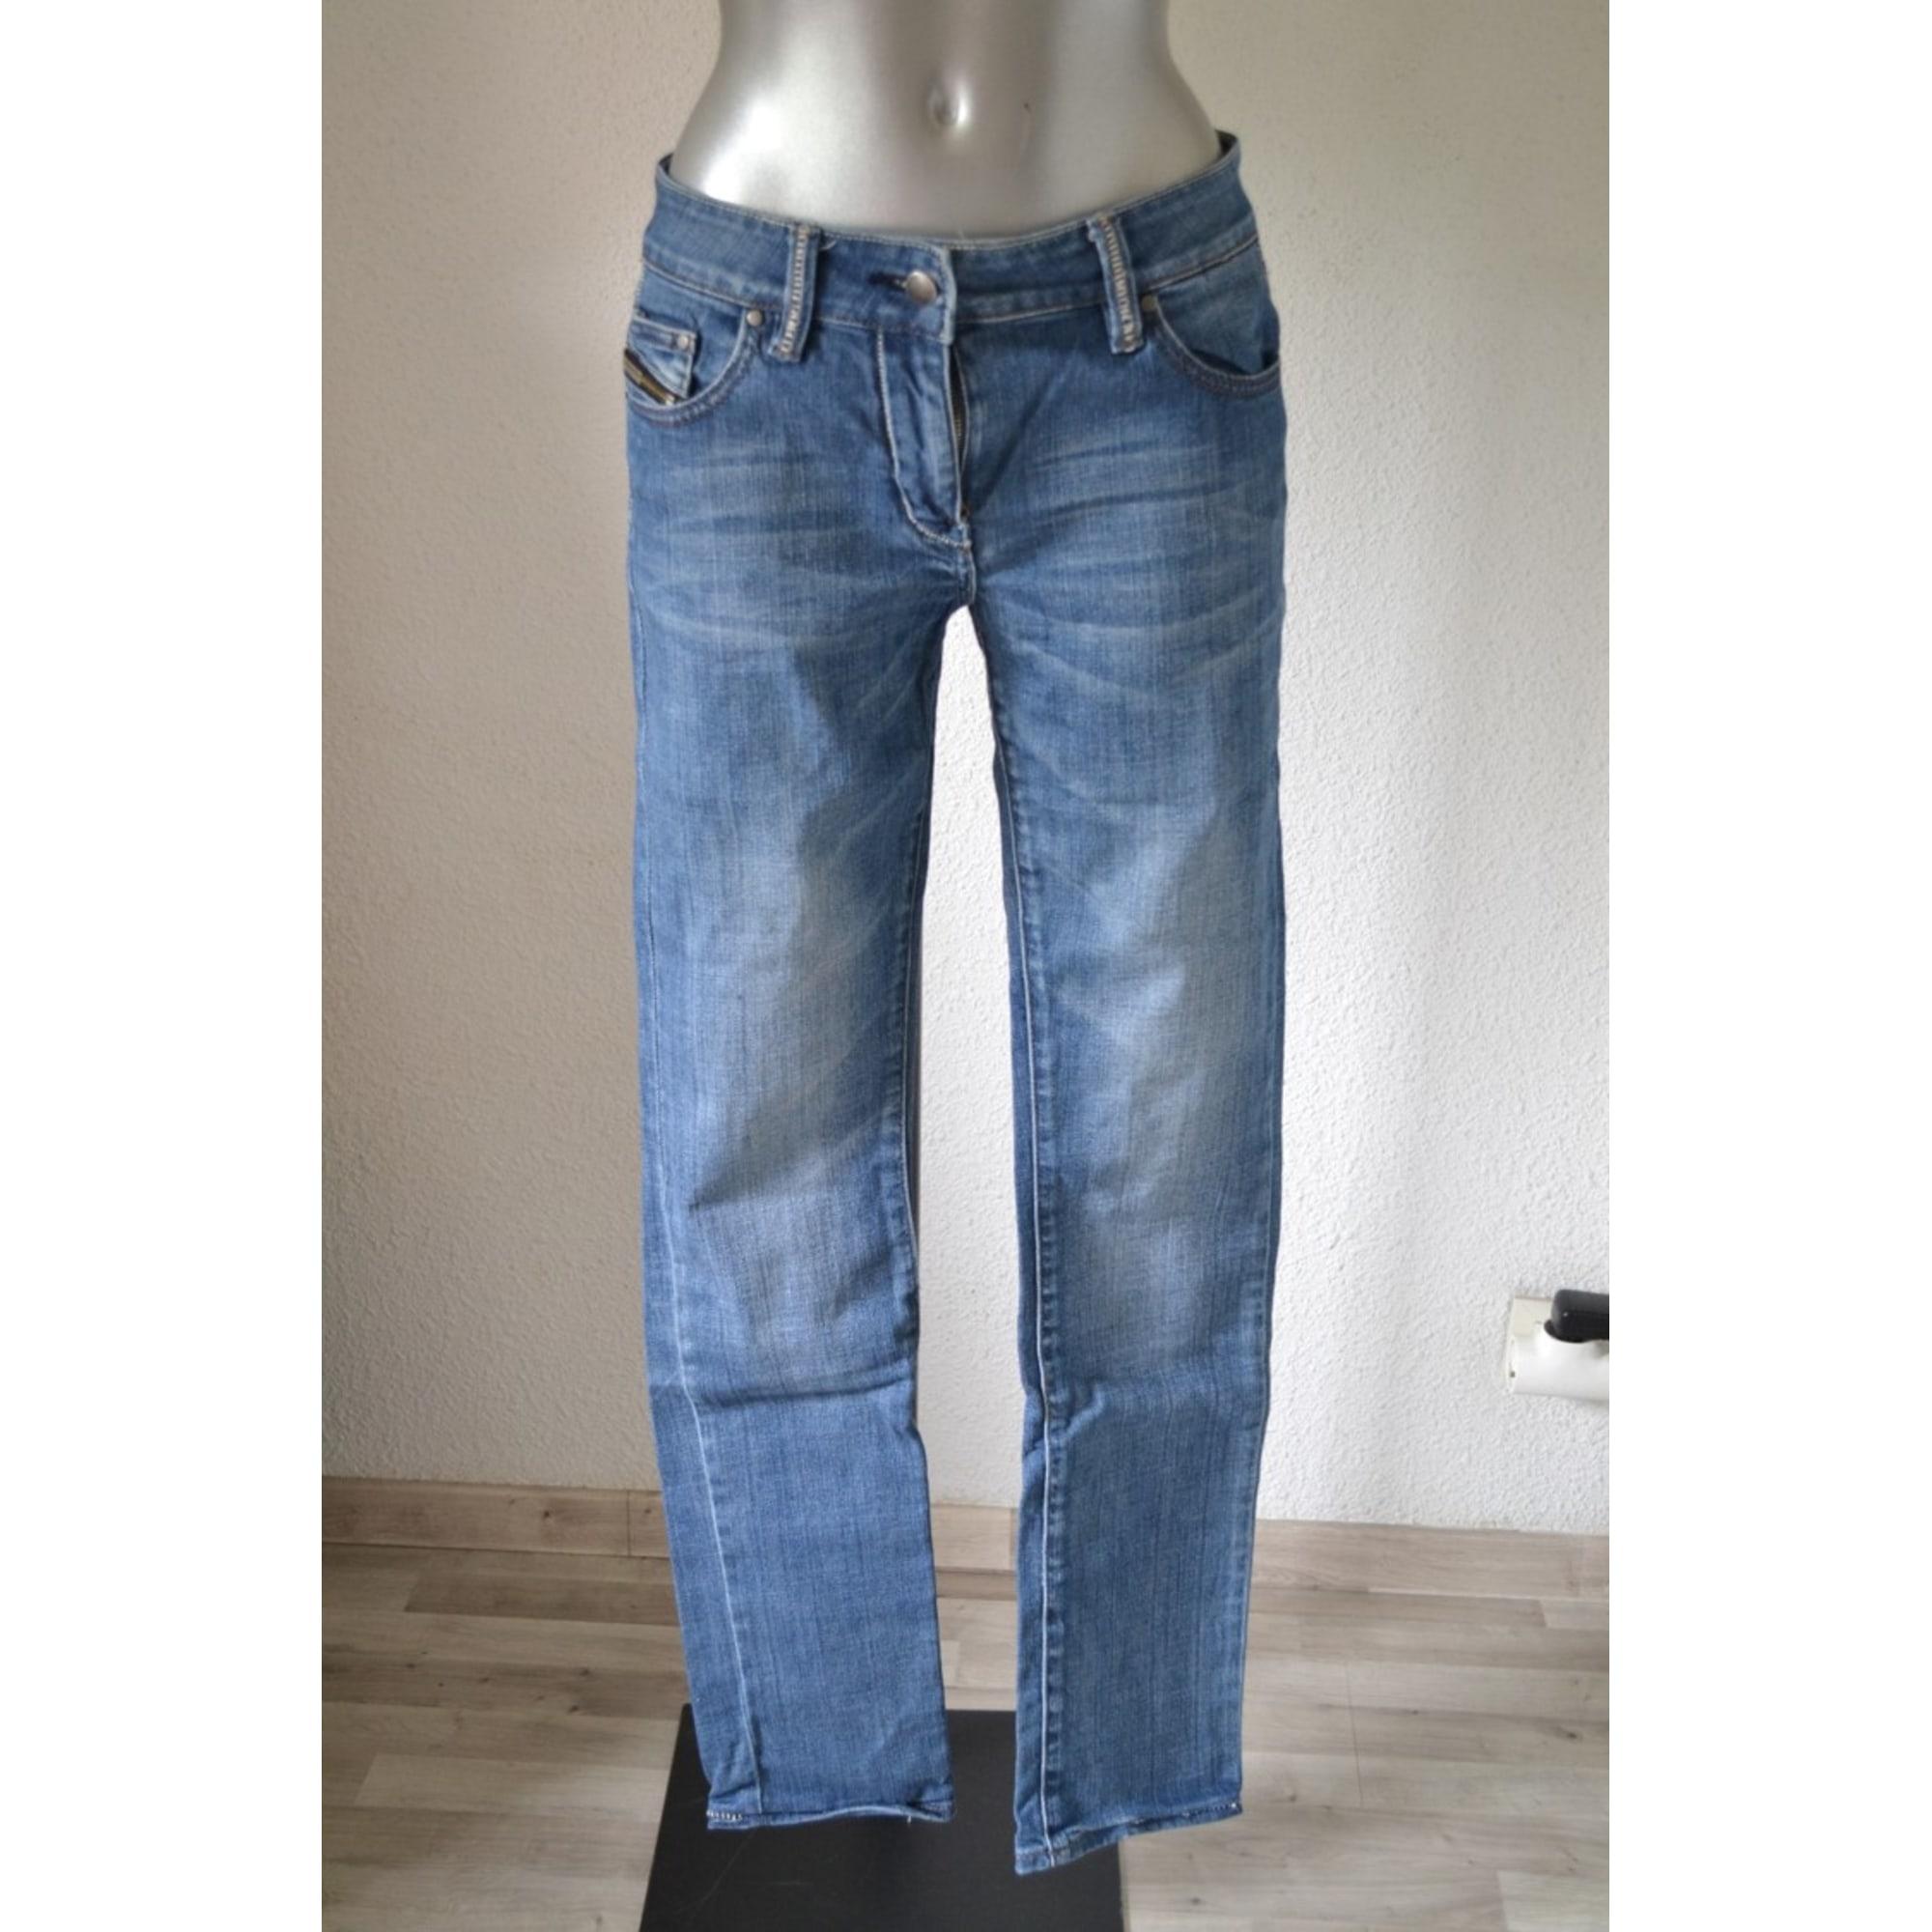 Jeans slim ETAM Bleu, bleu marine, bleu turquoise